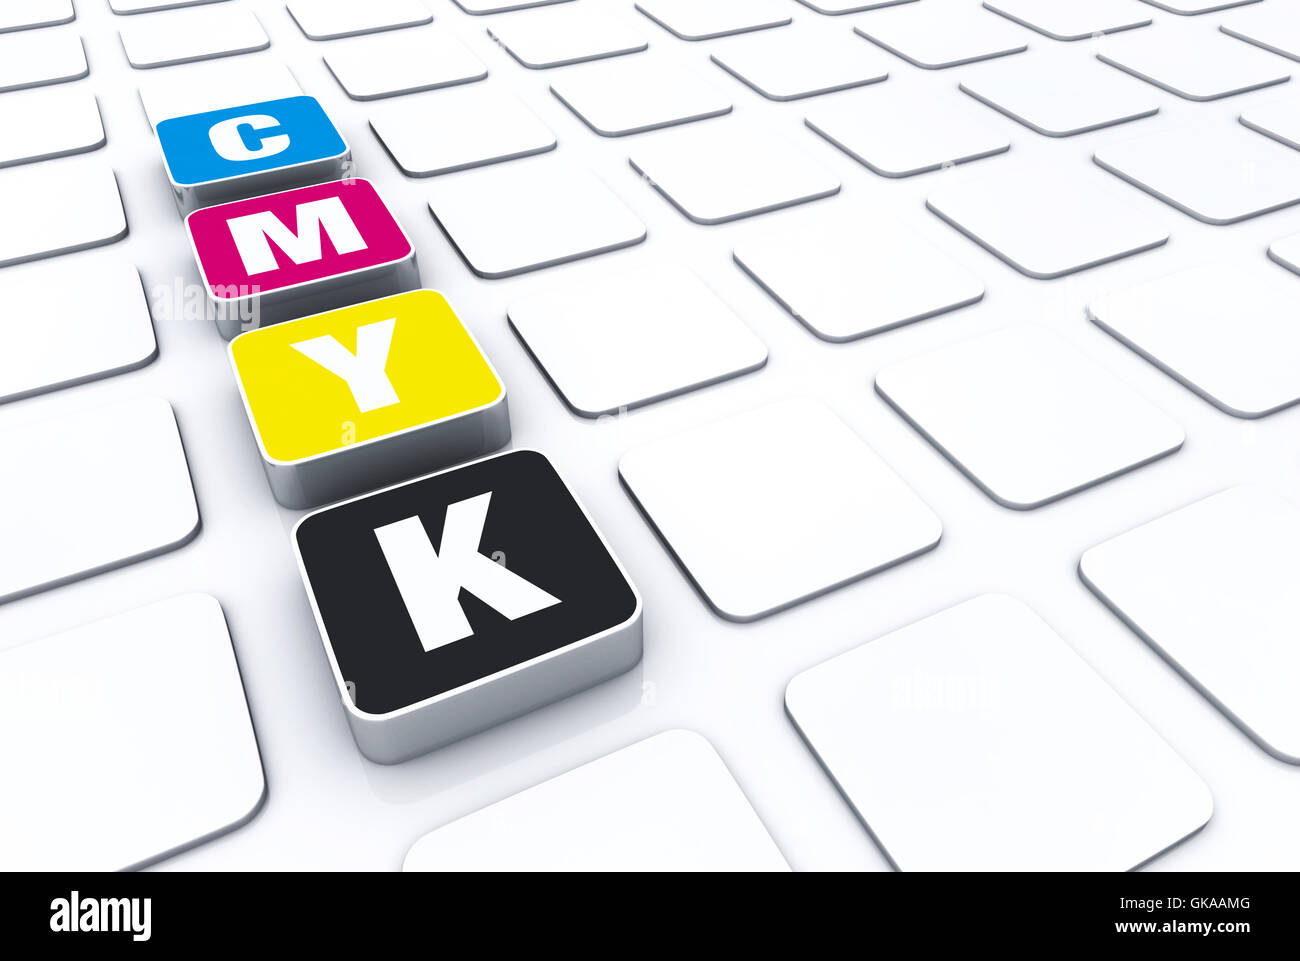 cmyk 3d pad symbolism 2 - Stock Image